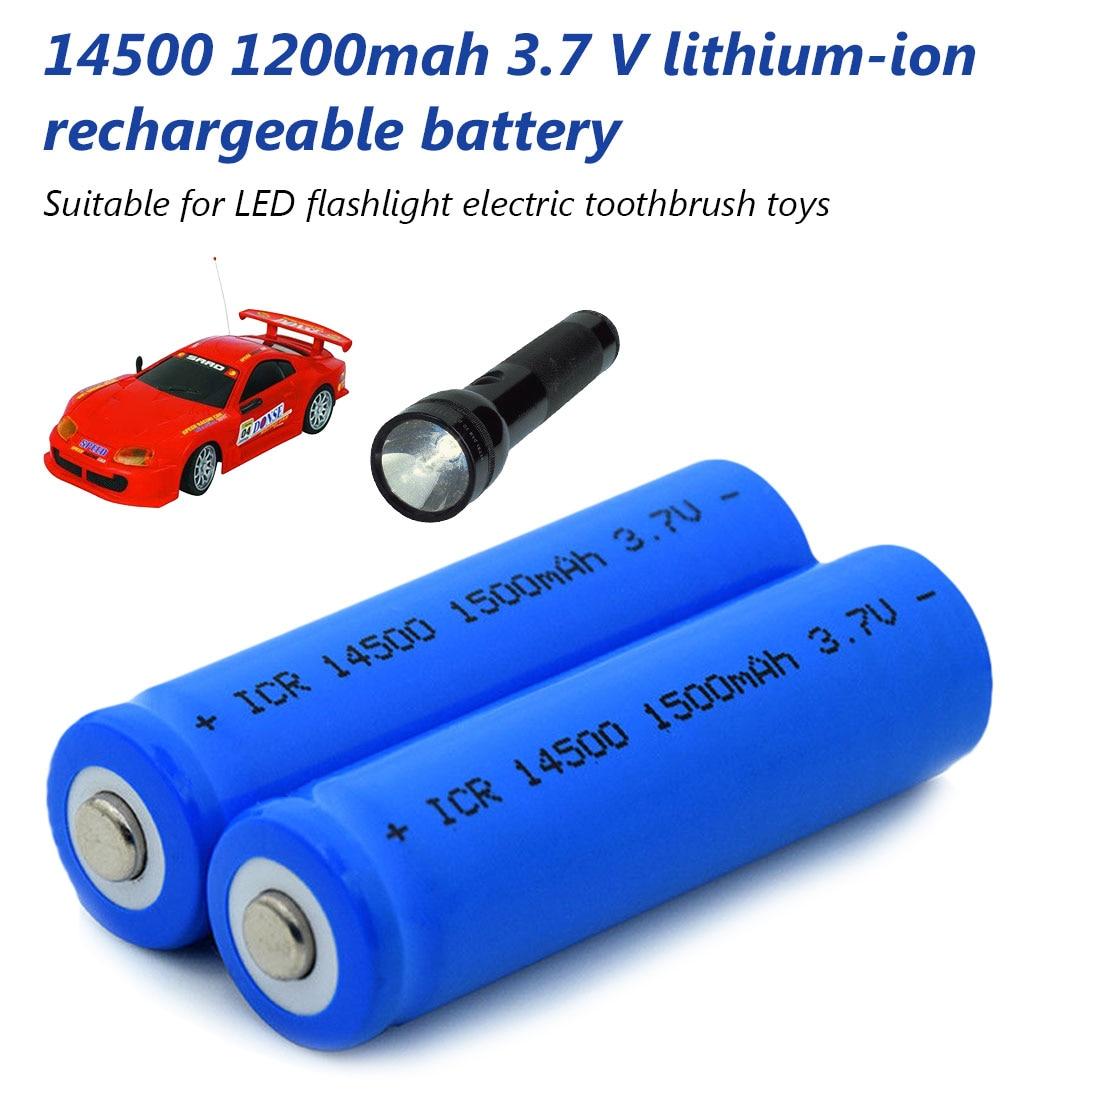 1/2 /4/8/12Pcs/Set AA 14500 800mah 3.7 V Lithium Ion Rechargeable Li-ion Battery For Led Flashlight Headlamps